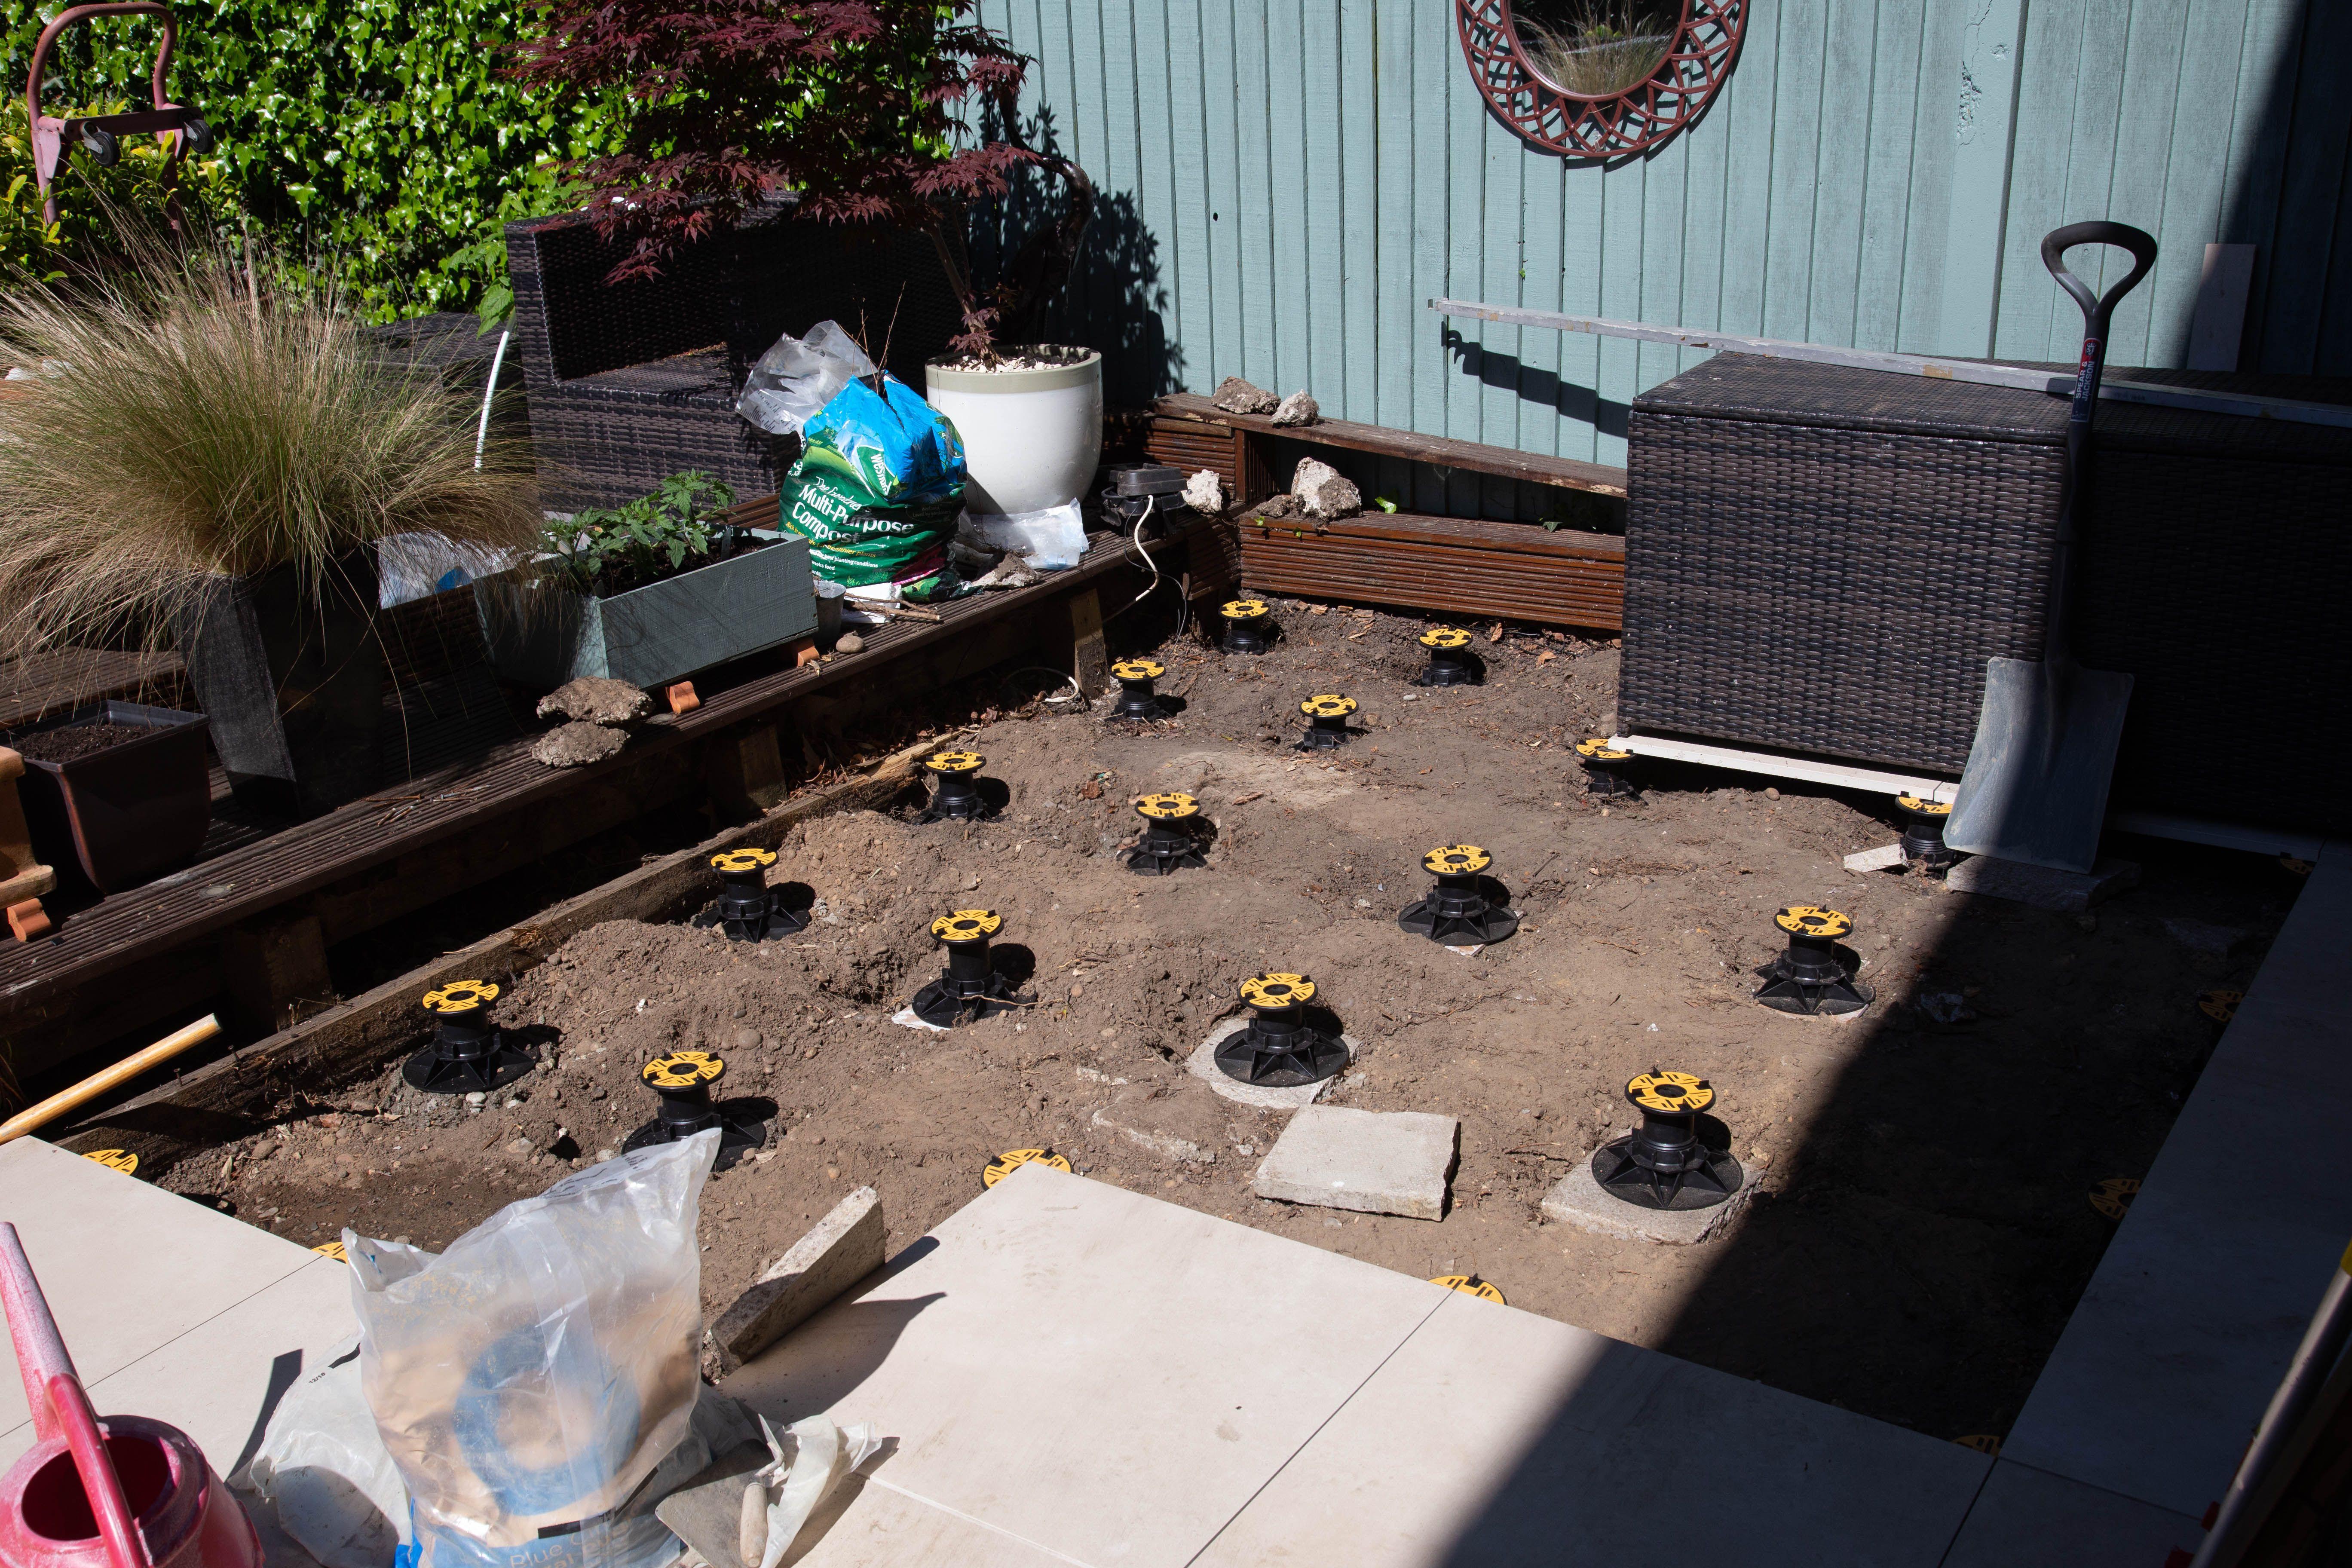 Luxury Patio Construction West Wickham London In 2020 Garden Paving Refurbishing Pedestal